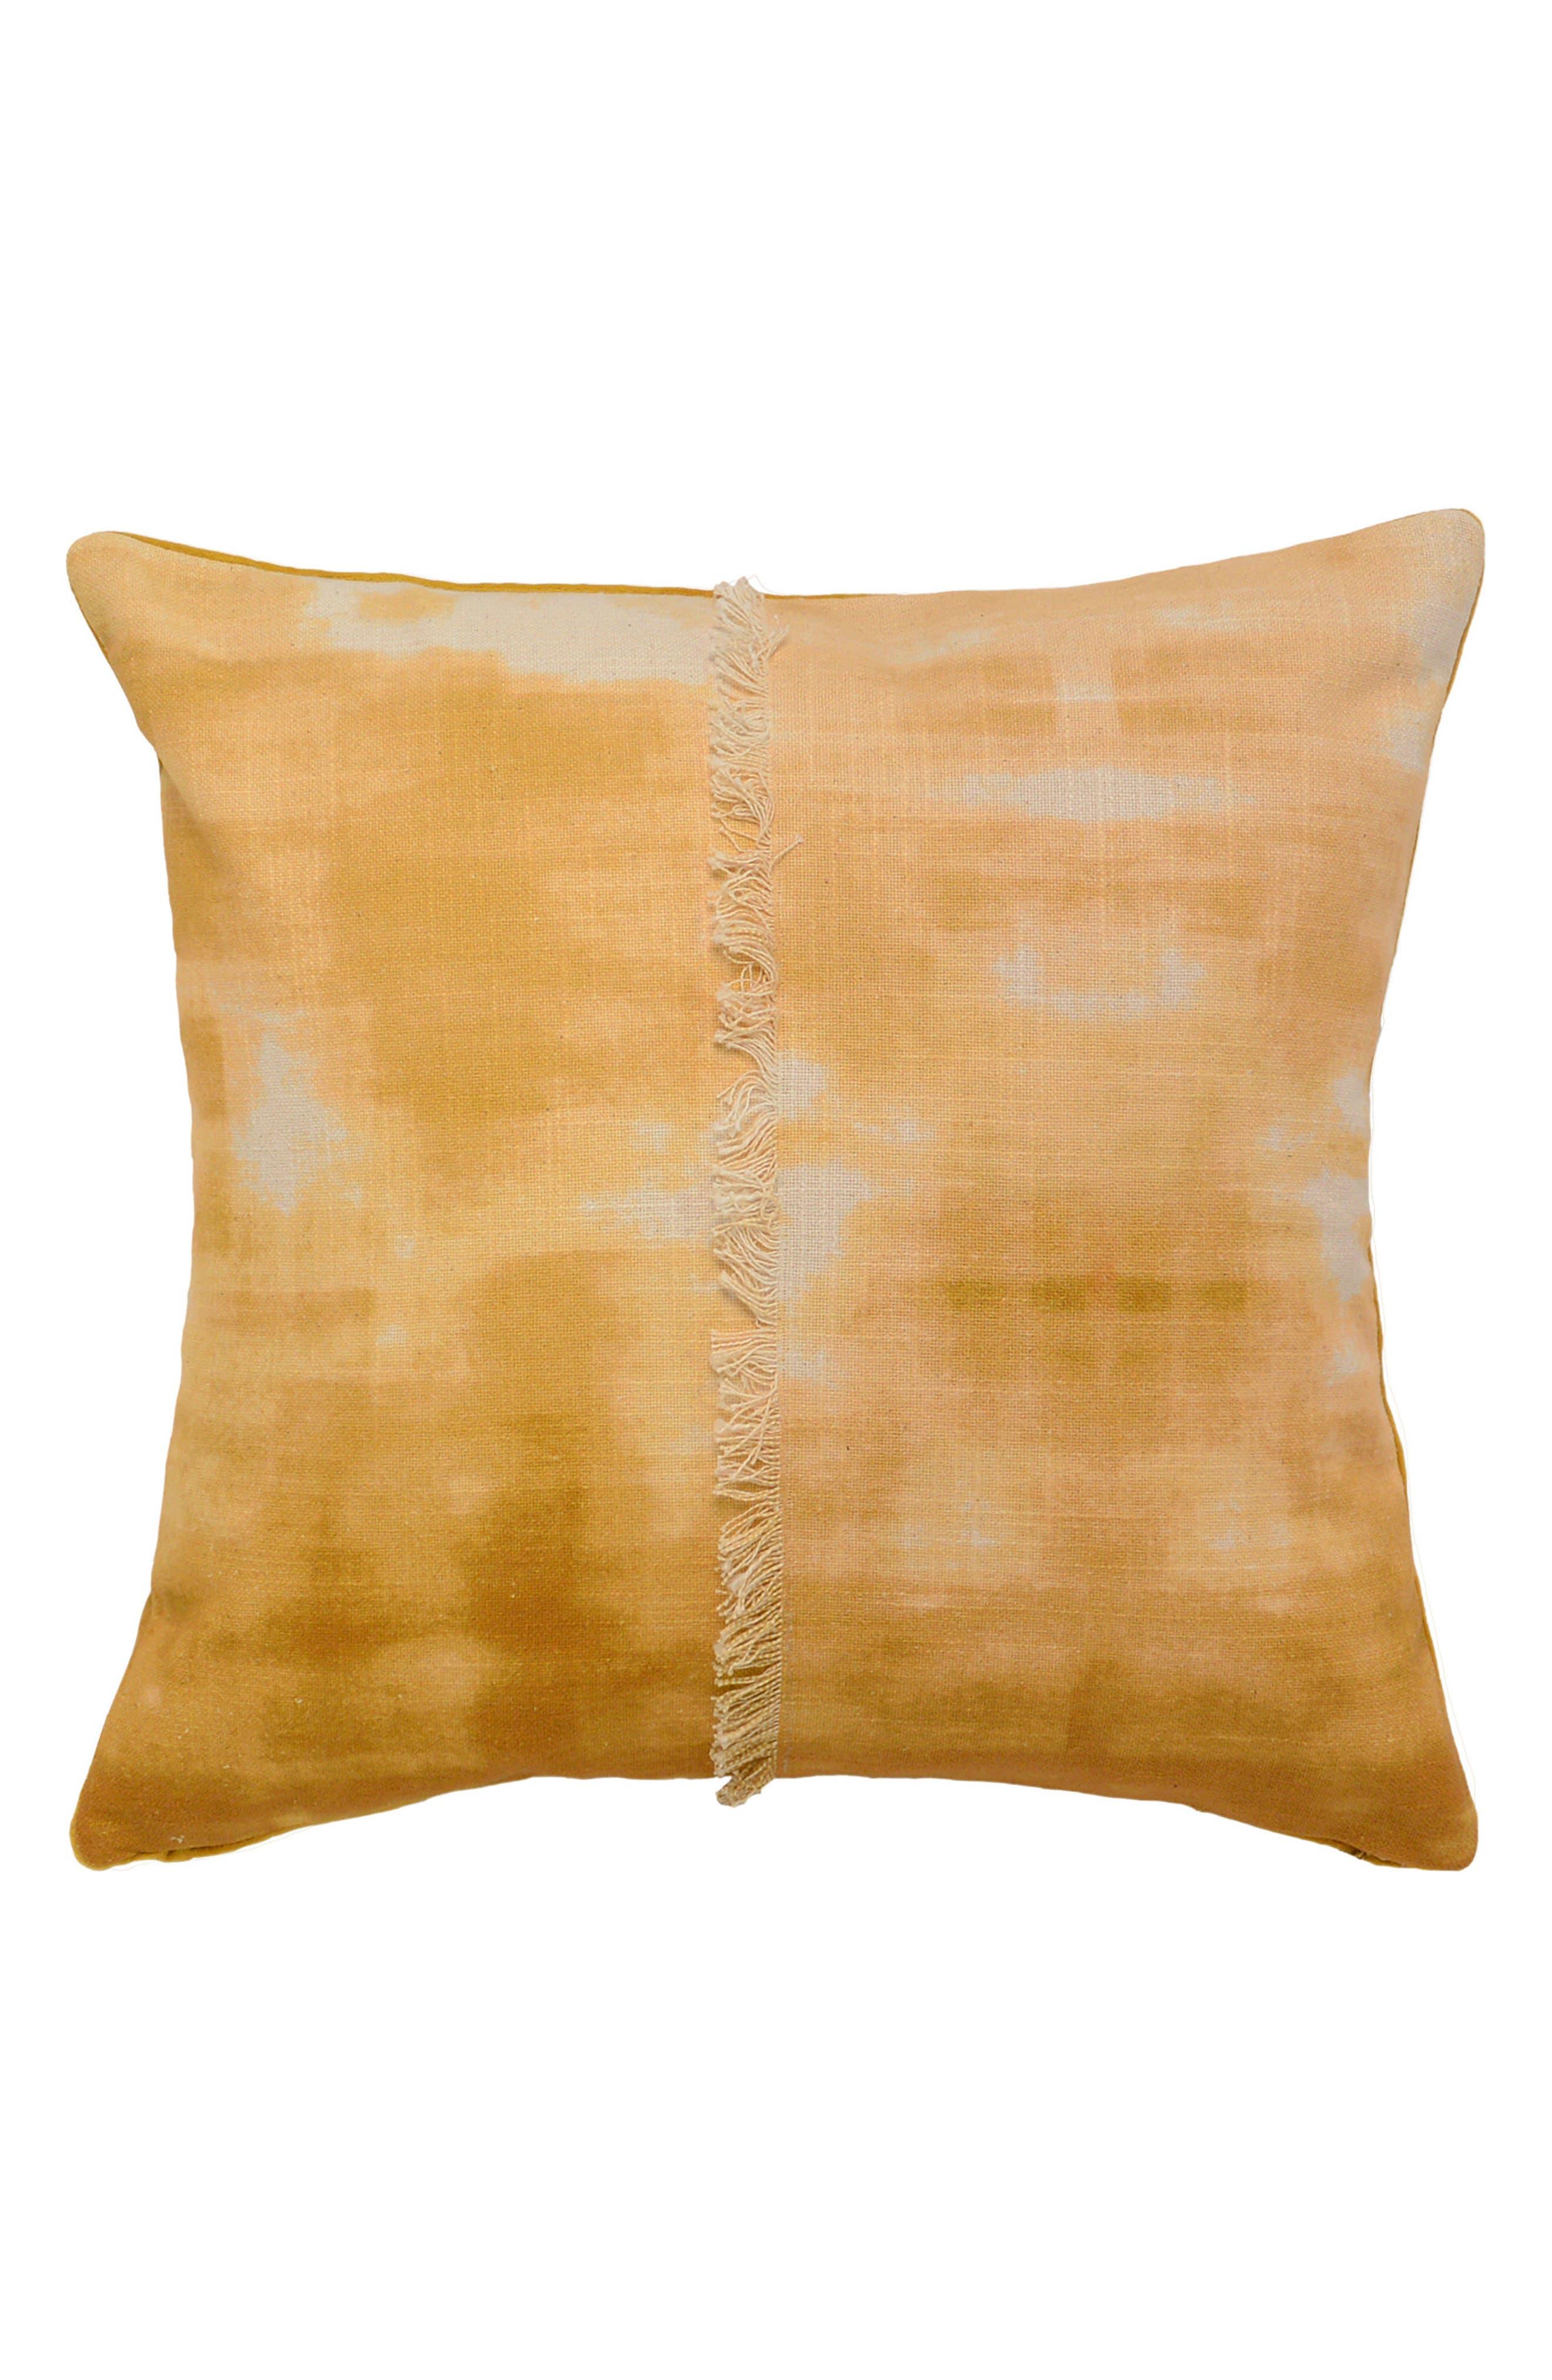 Kino Accent Pillow,                         Main,                         color, Ochre